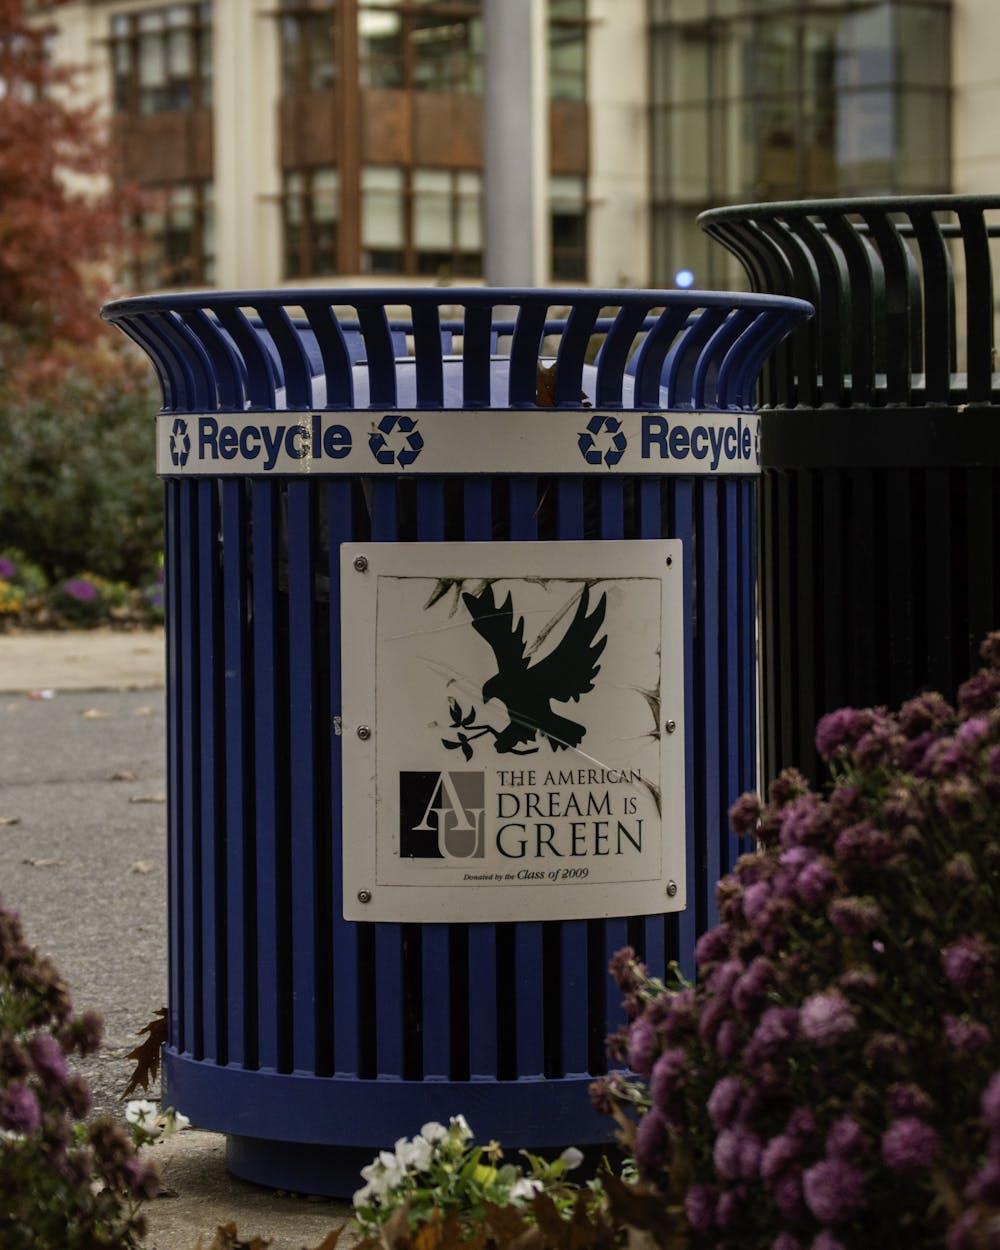 Zero Waste program urges students to trust the sustainability process